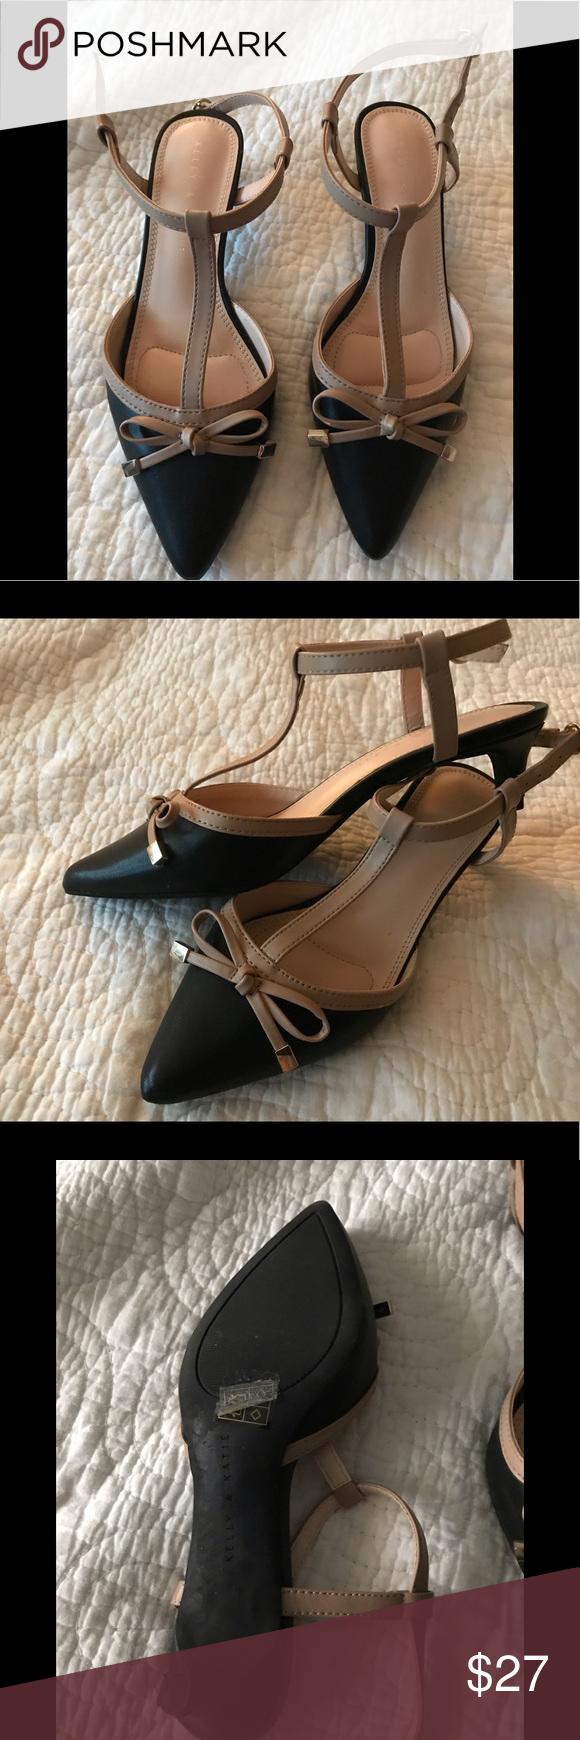 Kelly Katie Kitten Heels In 2020 Shoes Women Heels Kelly Katie Heels